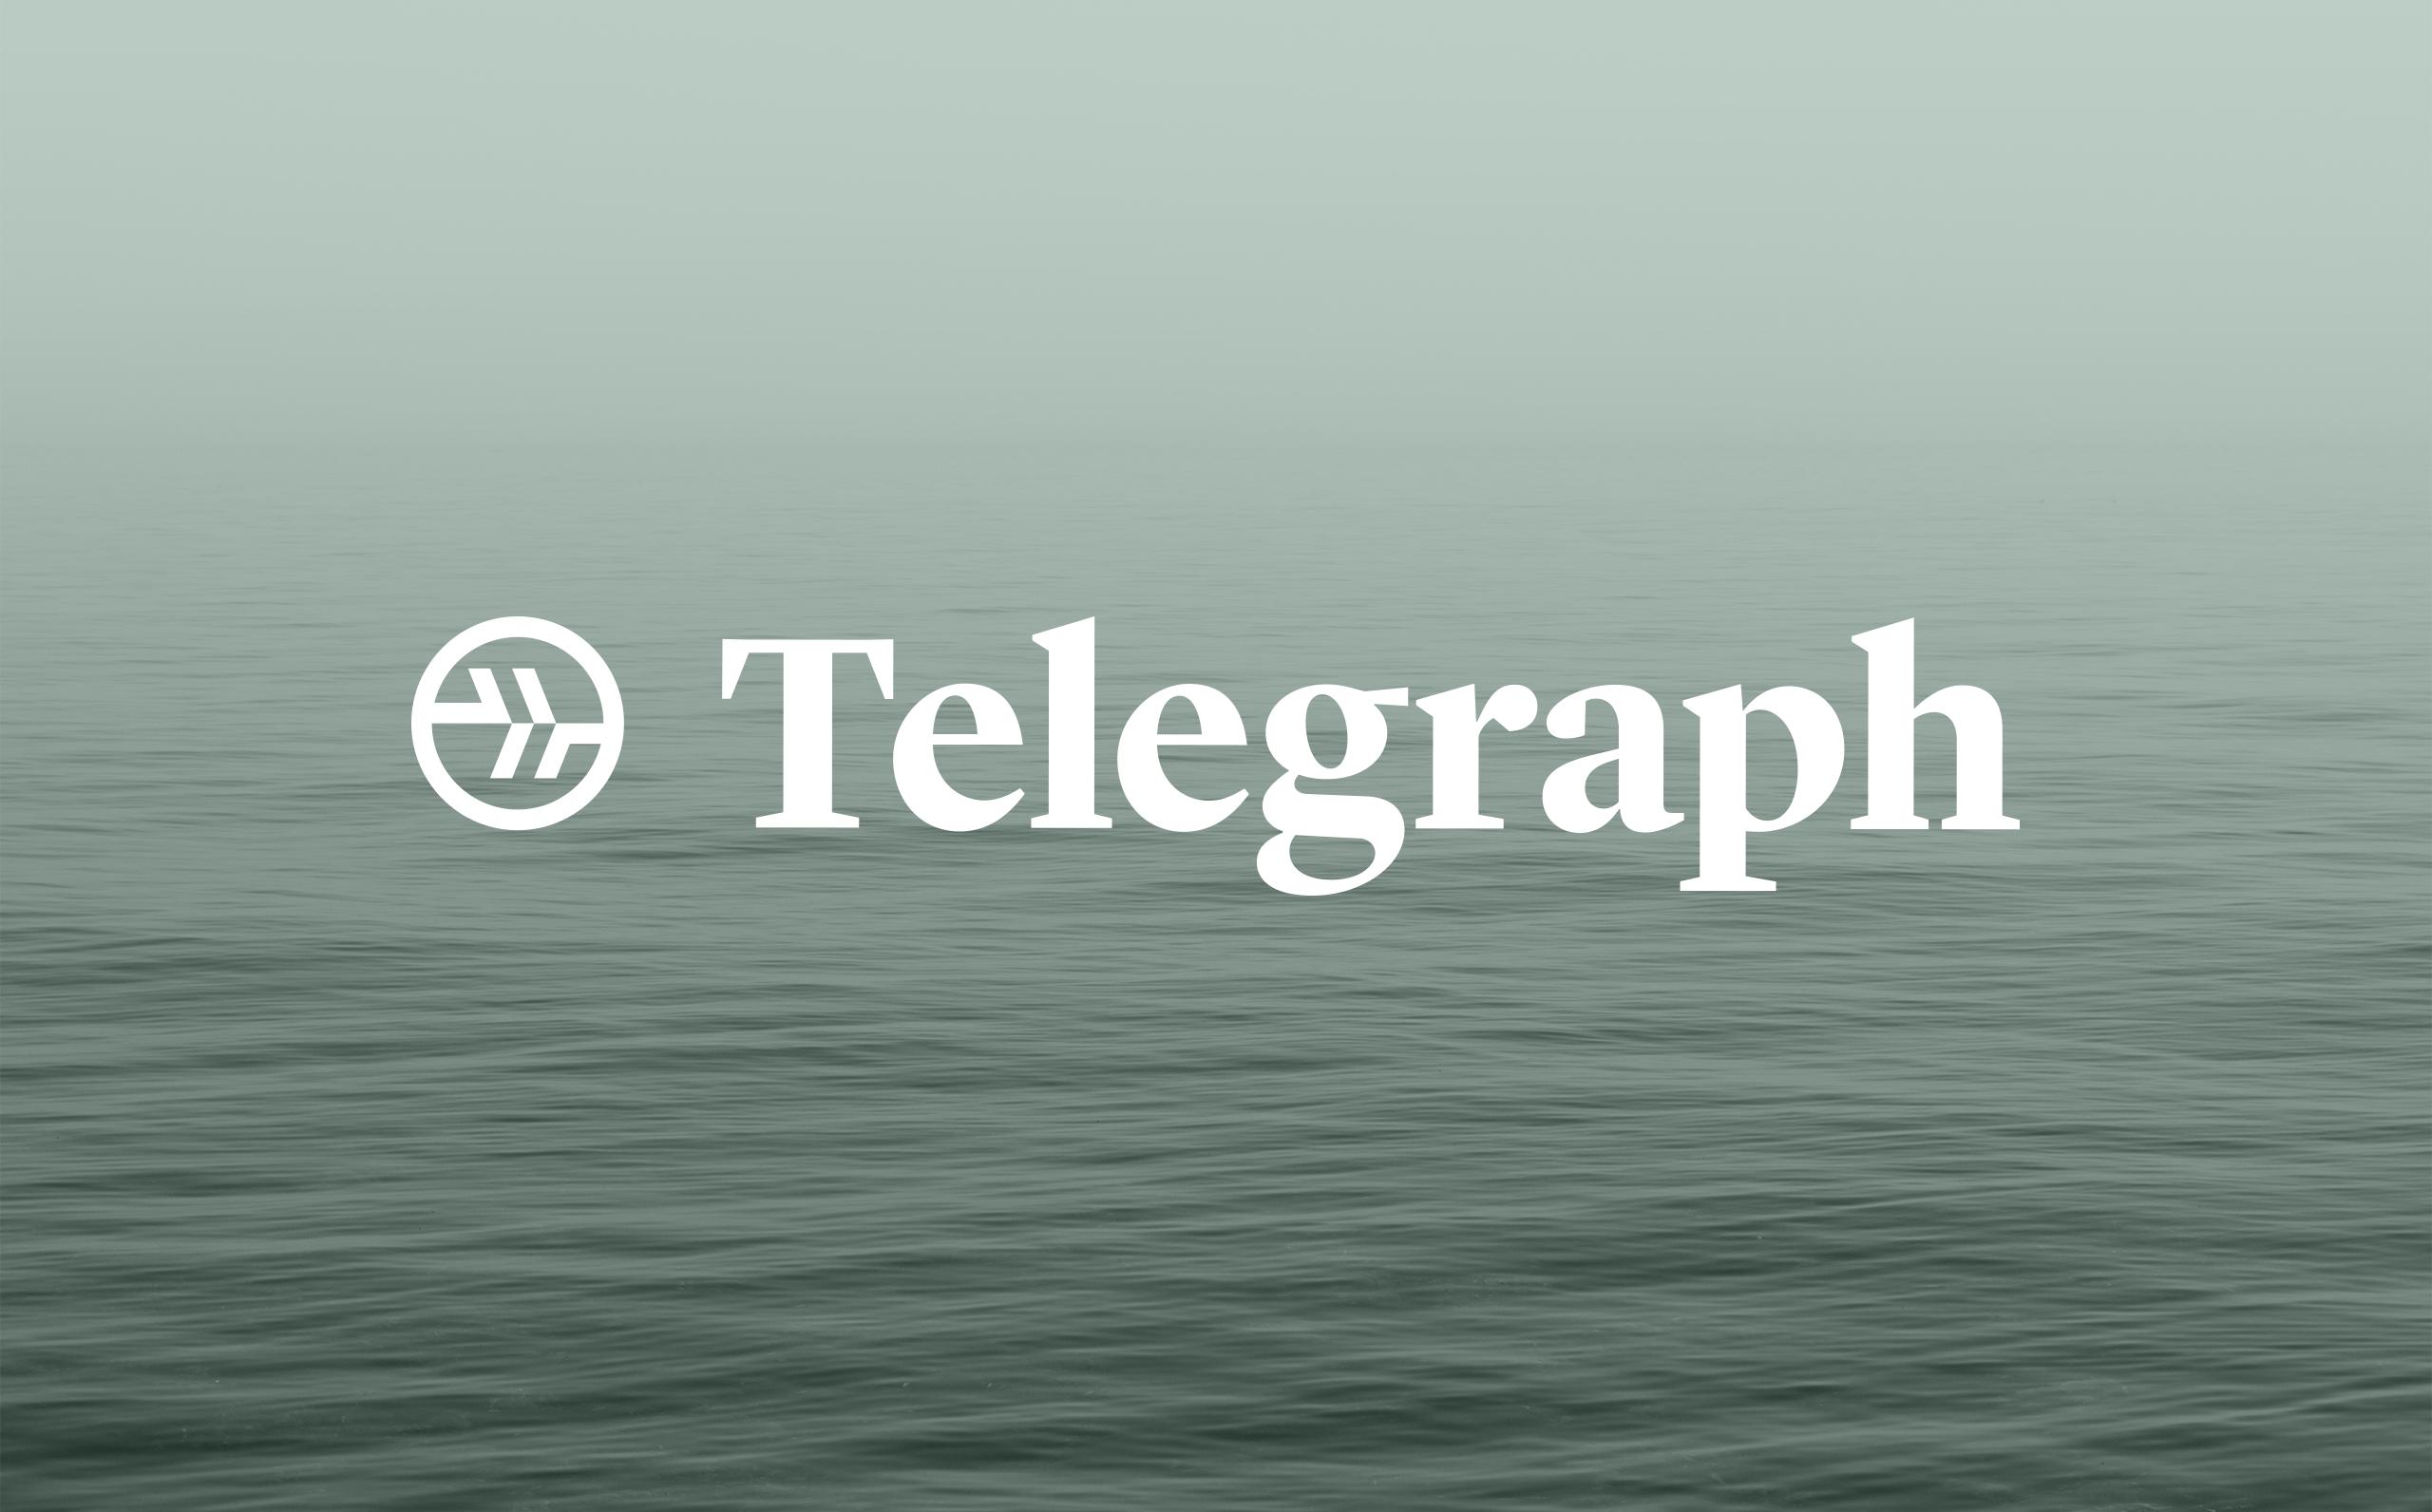 Telegraph_09